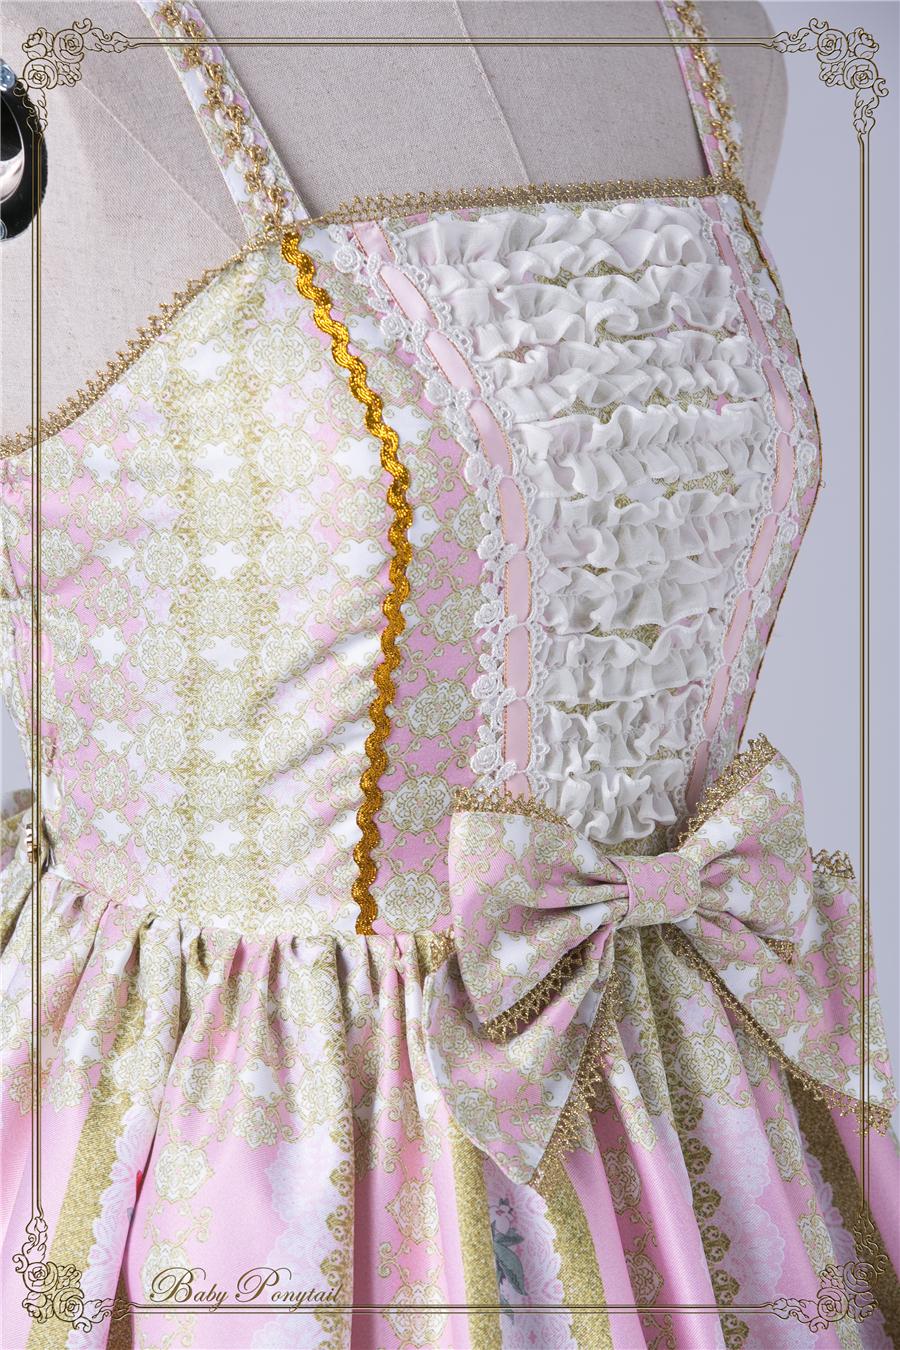 Baby Ponytail_Stock Photo_Rococo Bouquet_JSK Pink_3.jpg